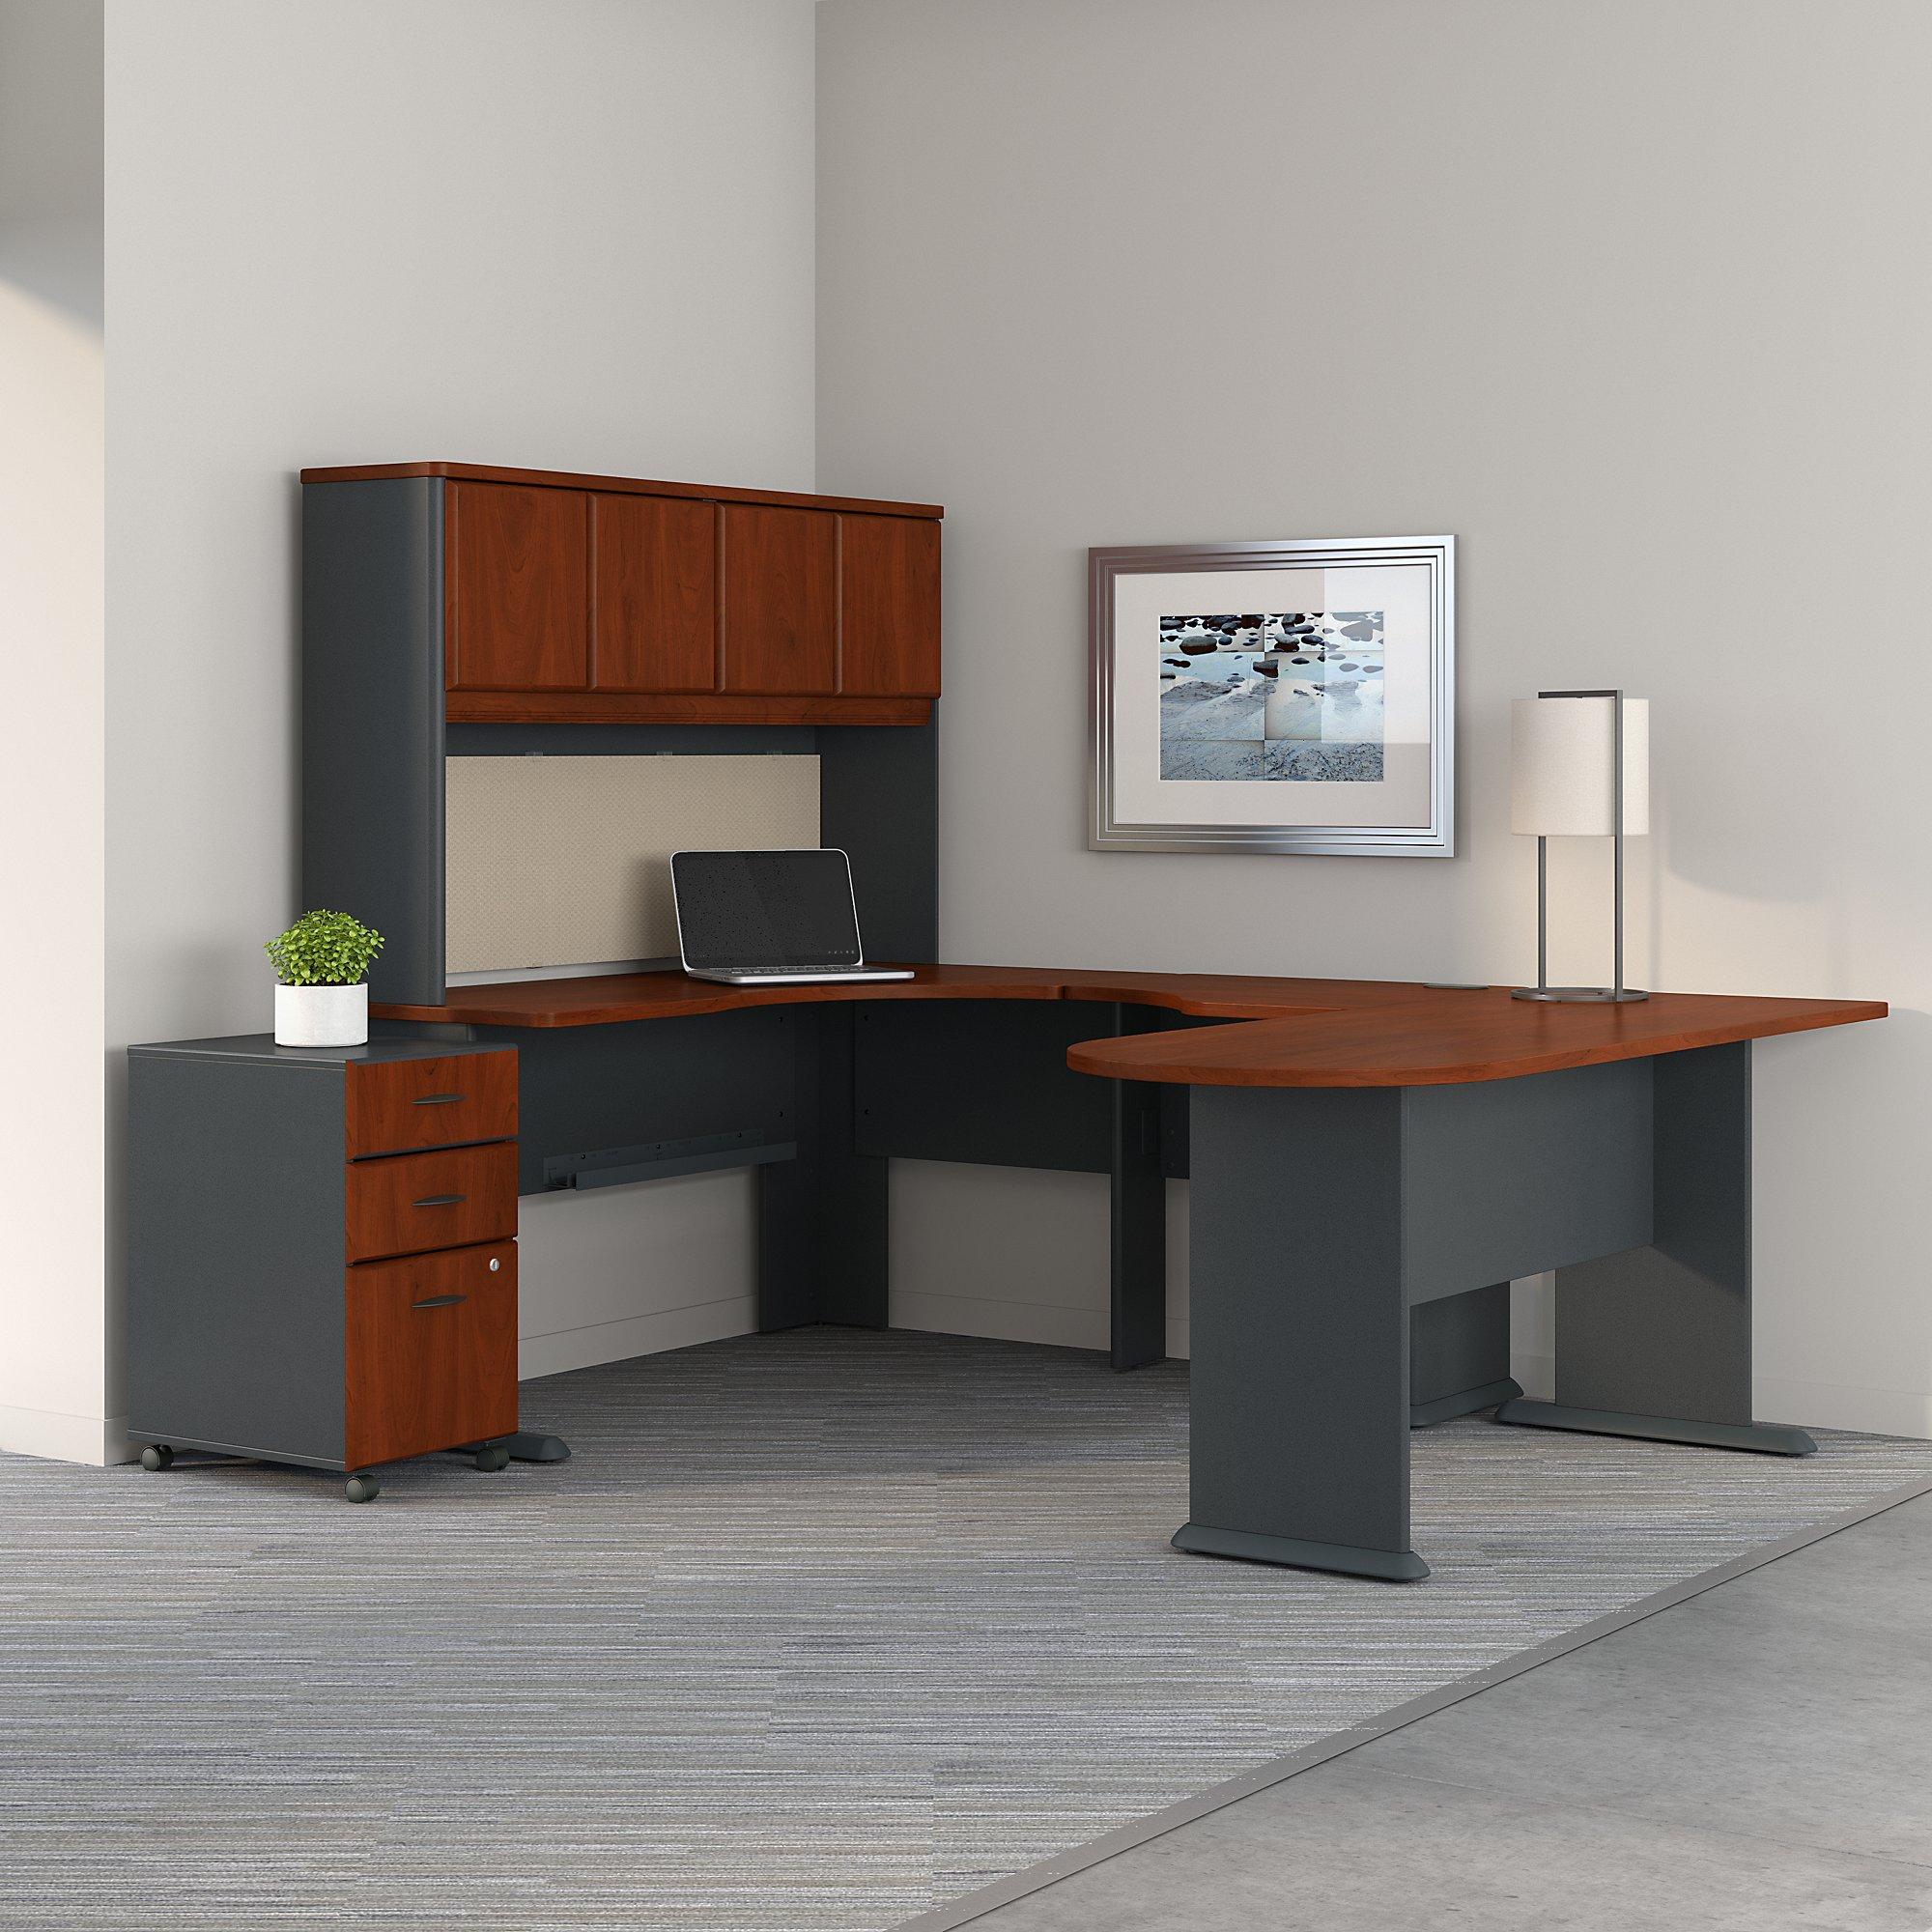 hansen cherry series a u shaped desk with hutch